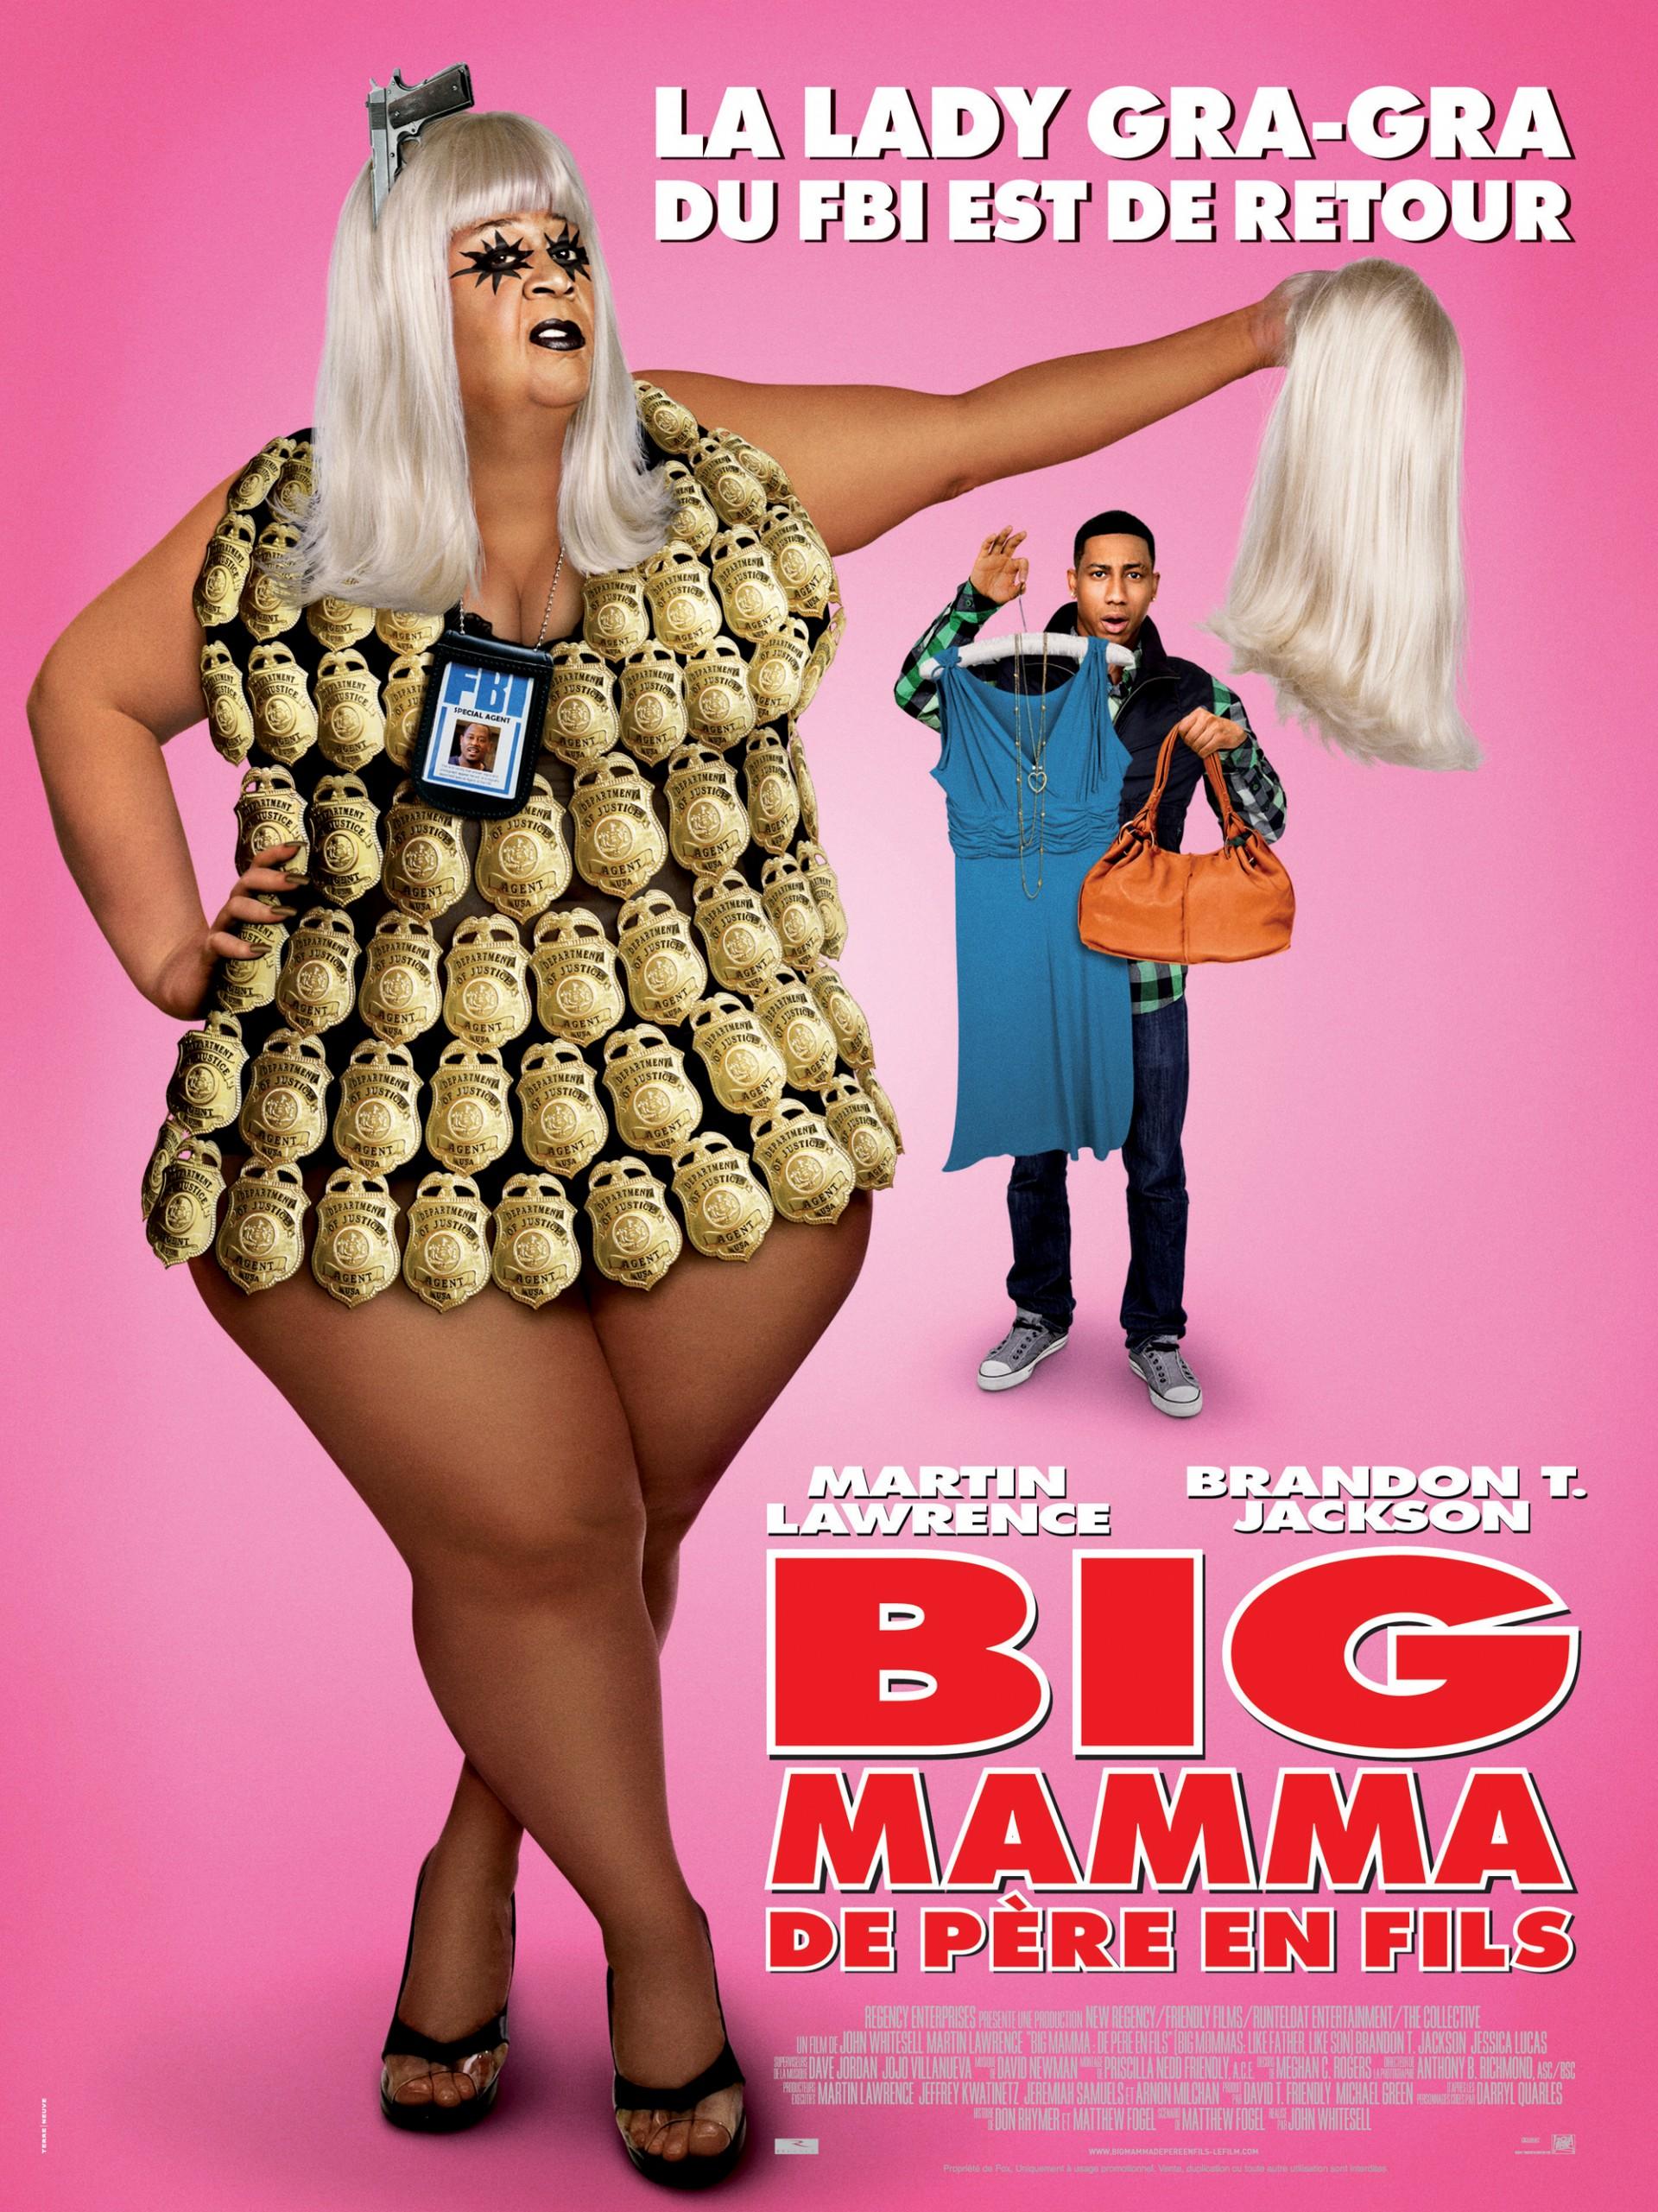 Big Mamma : de père en fils [DVDRiP] [FRENCH] [MULTI]